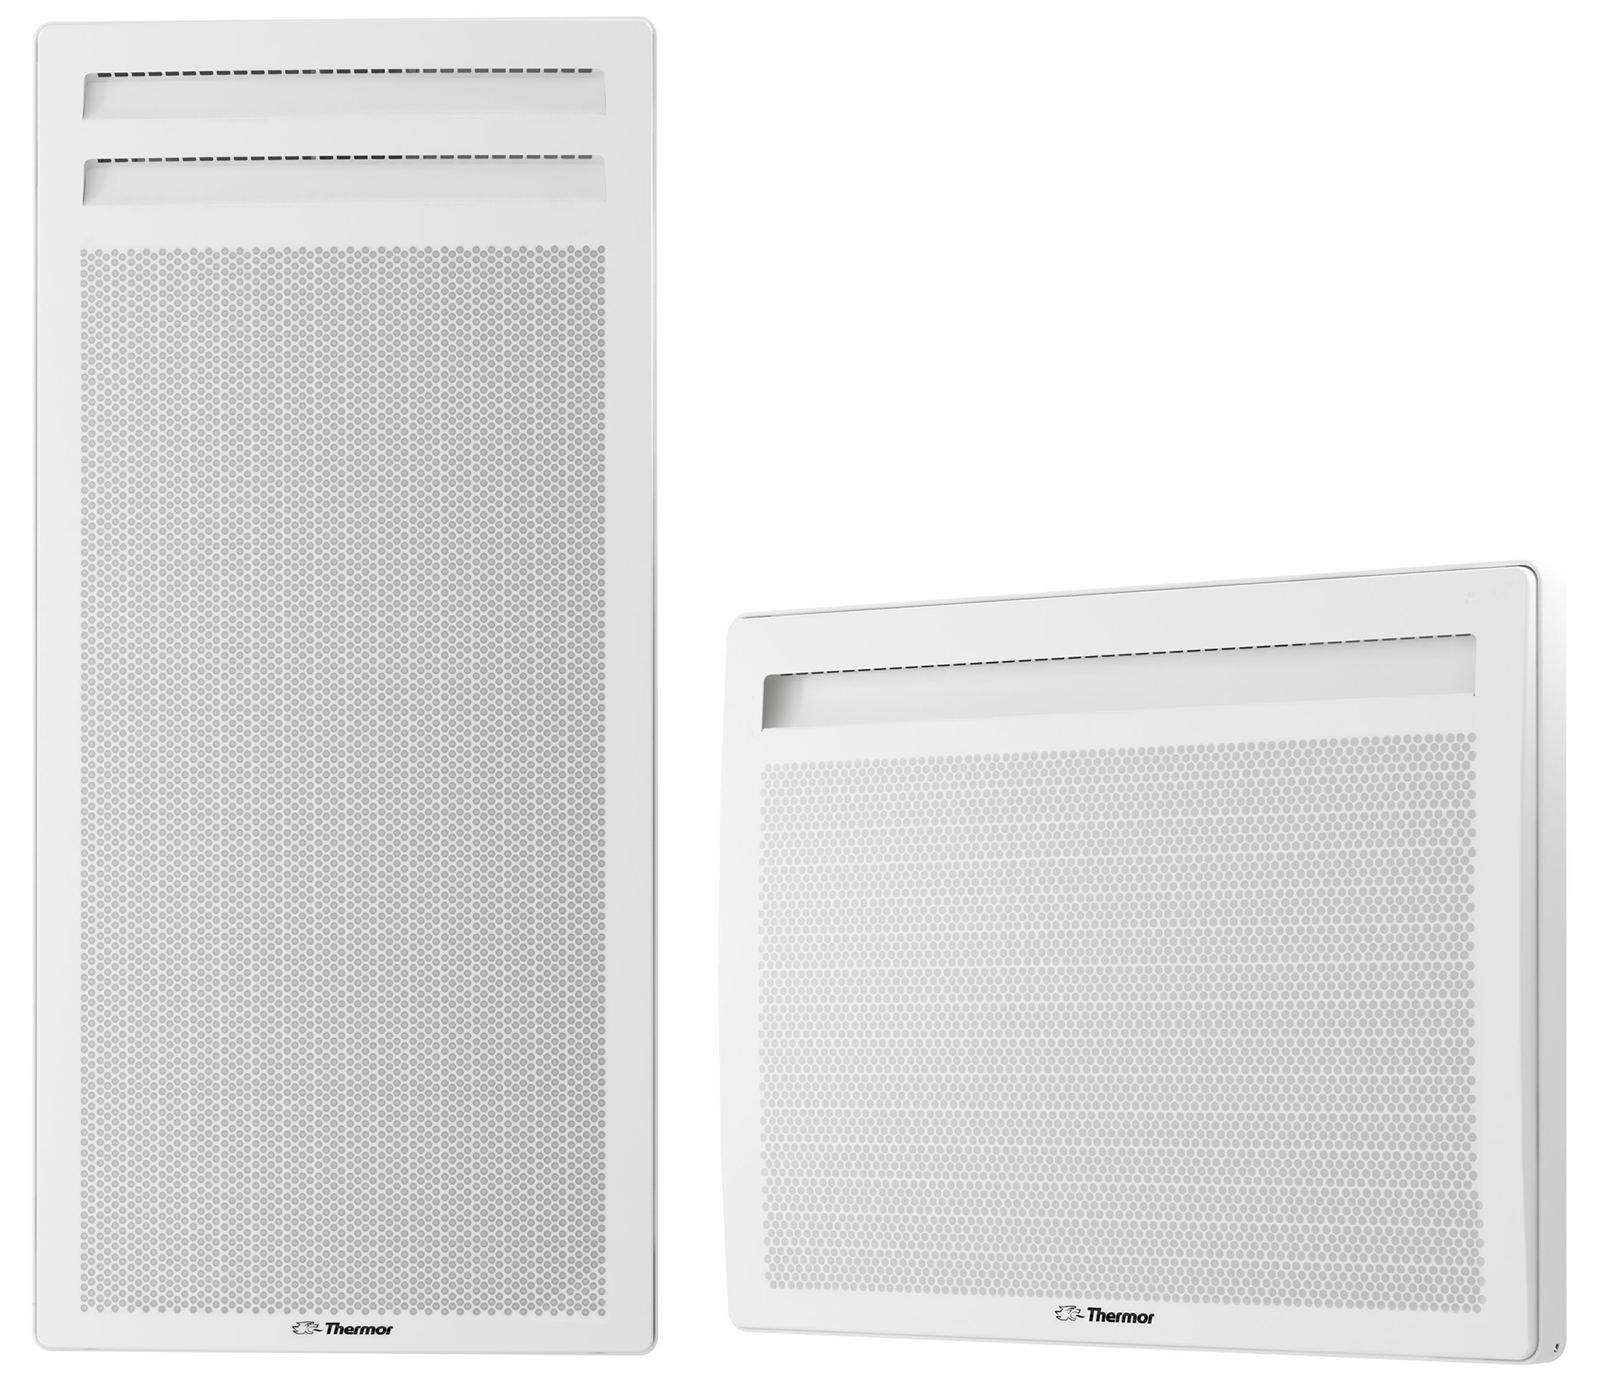 thermor radiateurs panneau rayonnants amadeus 2 puissance 1500 w h 961 l 451. Black Bedroom Furniture Sets. Home Design Ideas